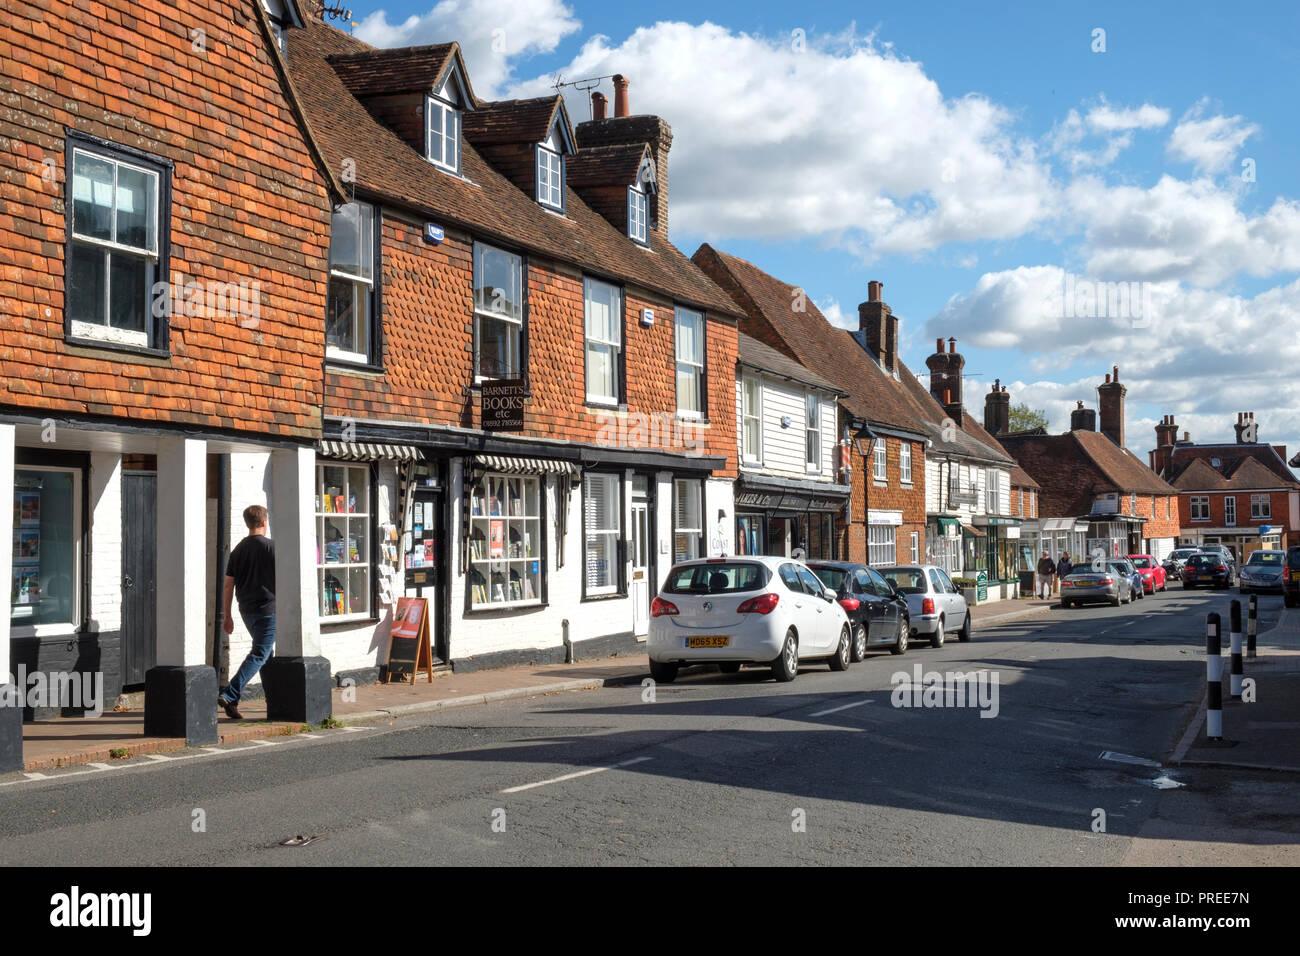 Wadhurst High Street, East Sussex, England, UK - Stock Image